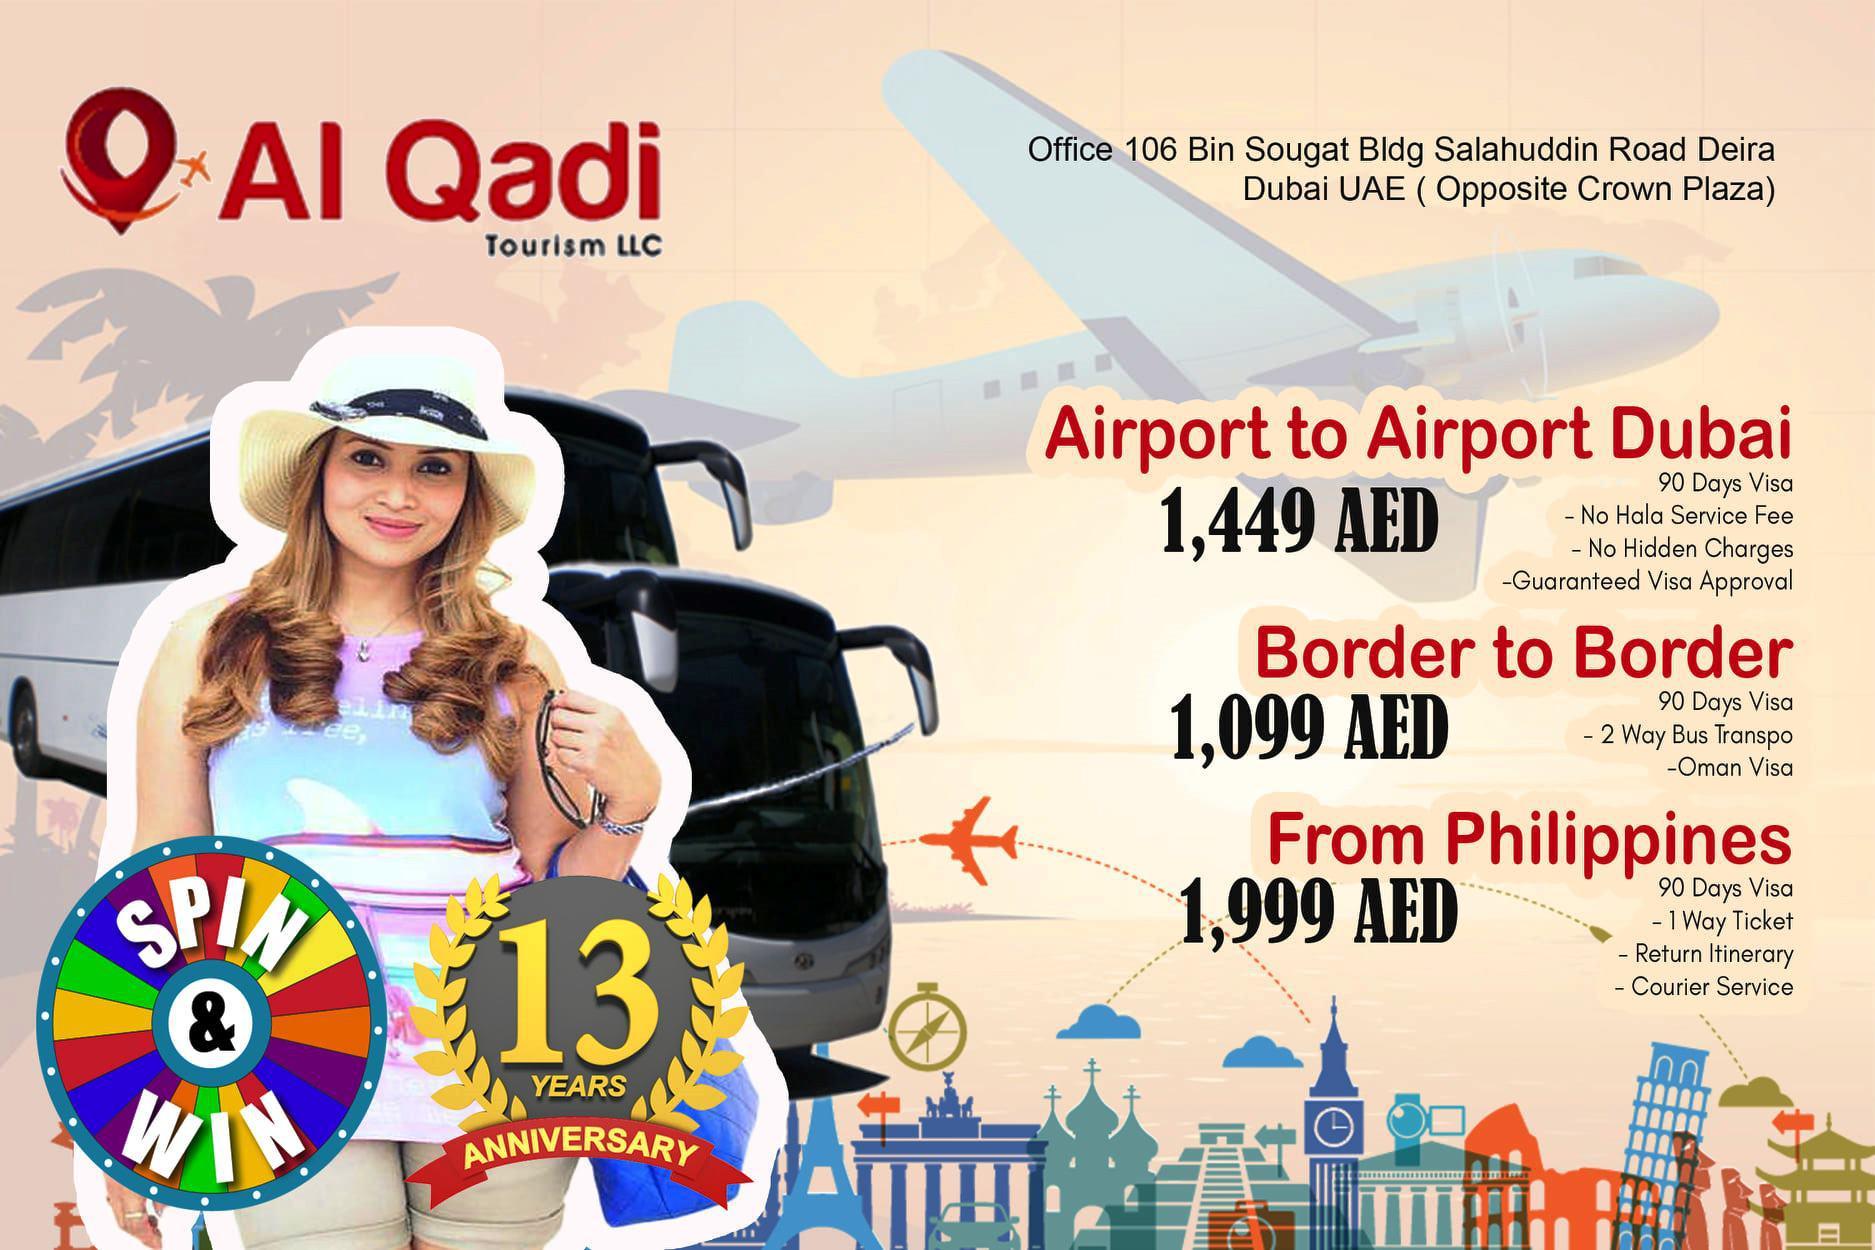 Al Qadi Tourism LLC